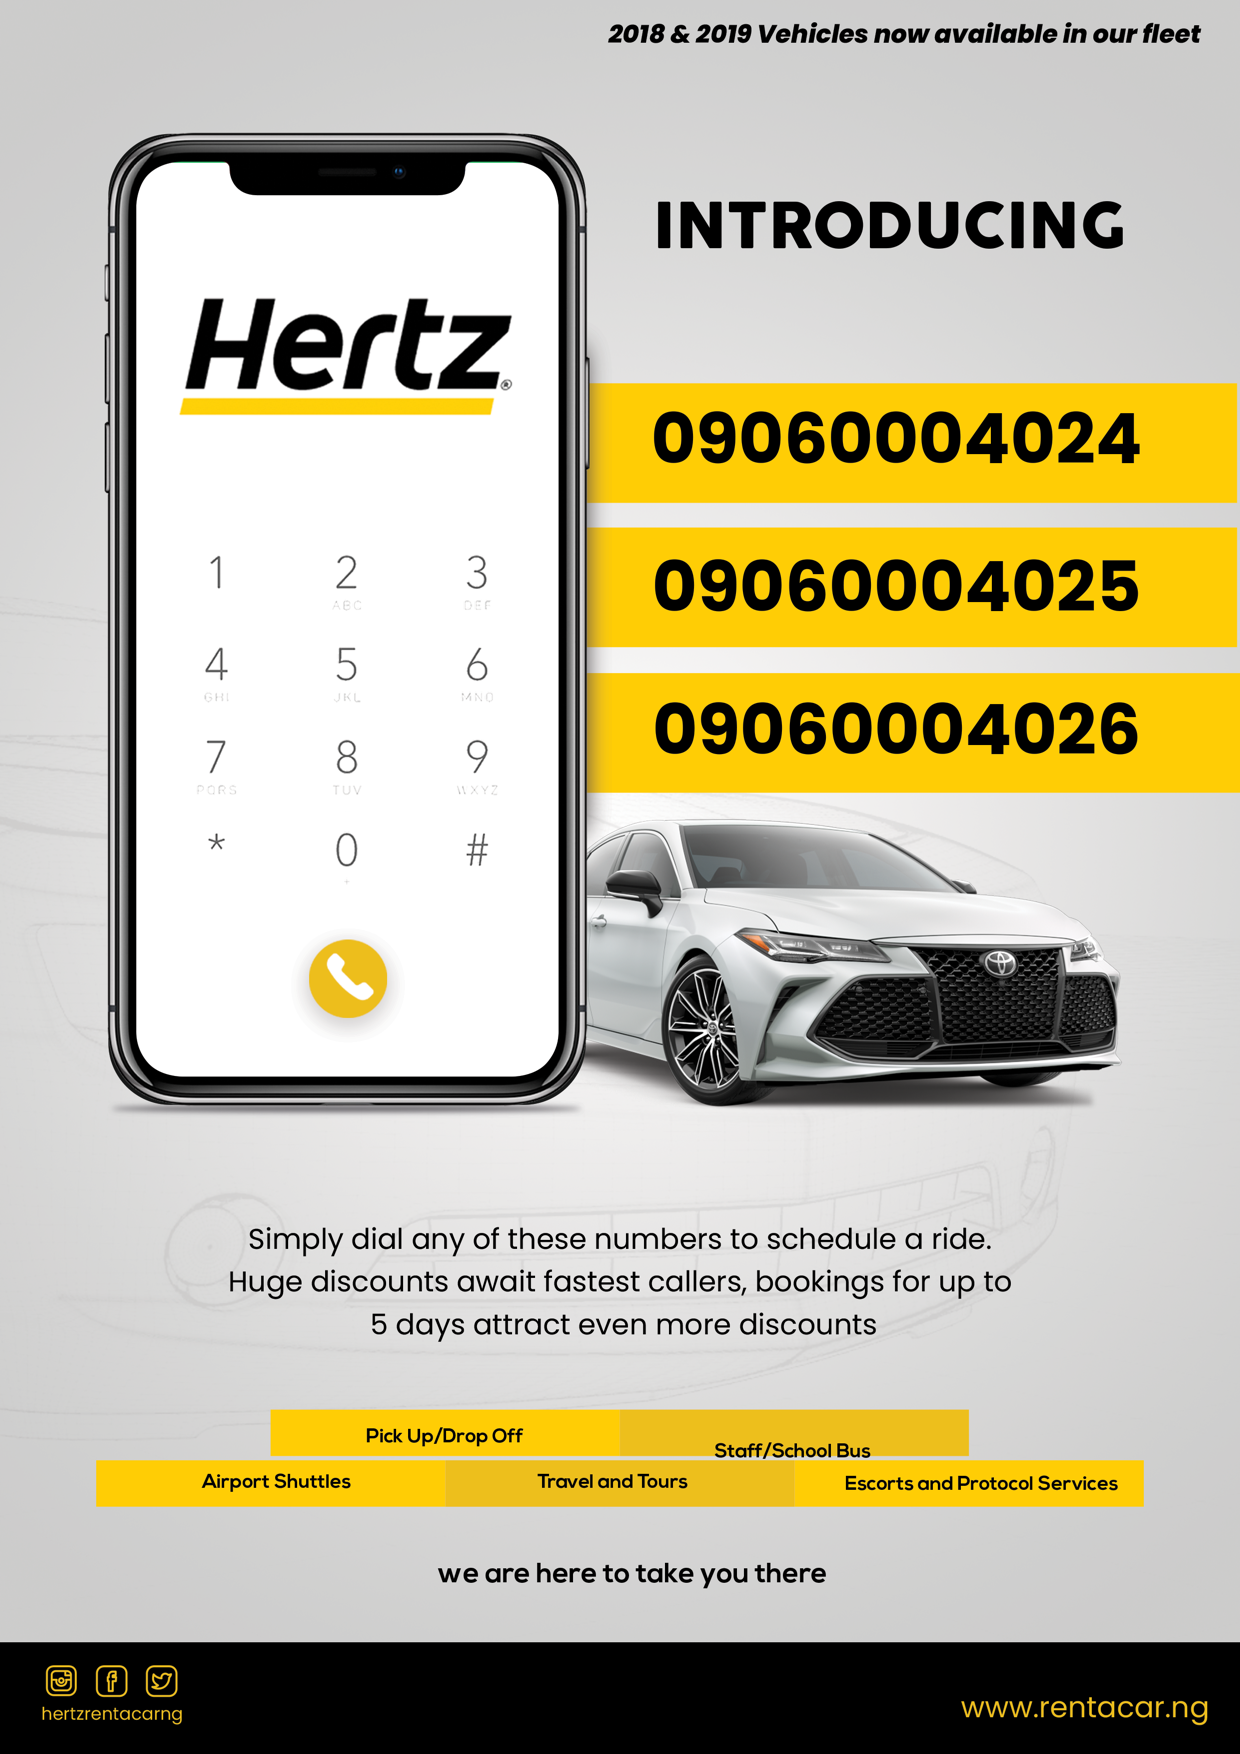 Phone numbers for Hertz Nigeria